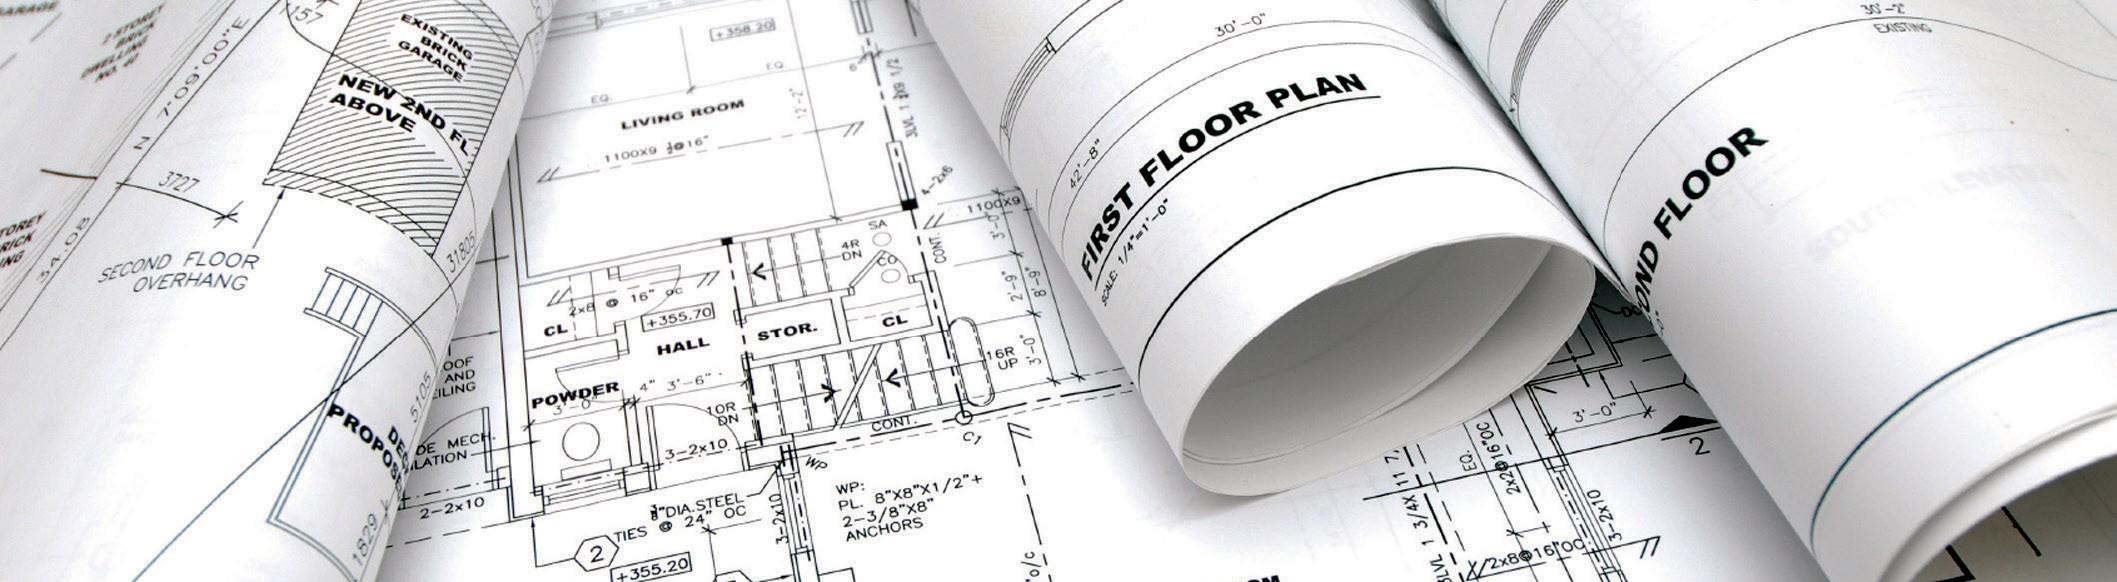 design-planning.jpg